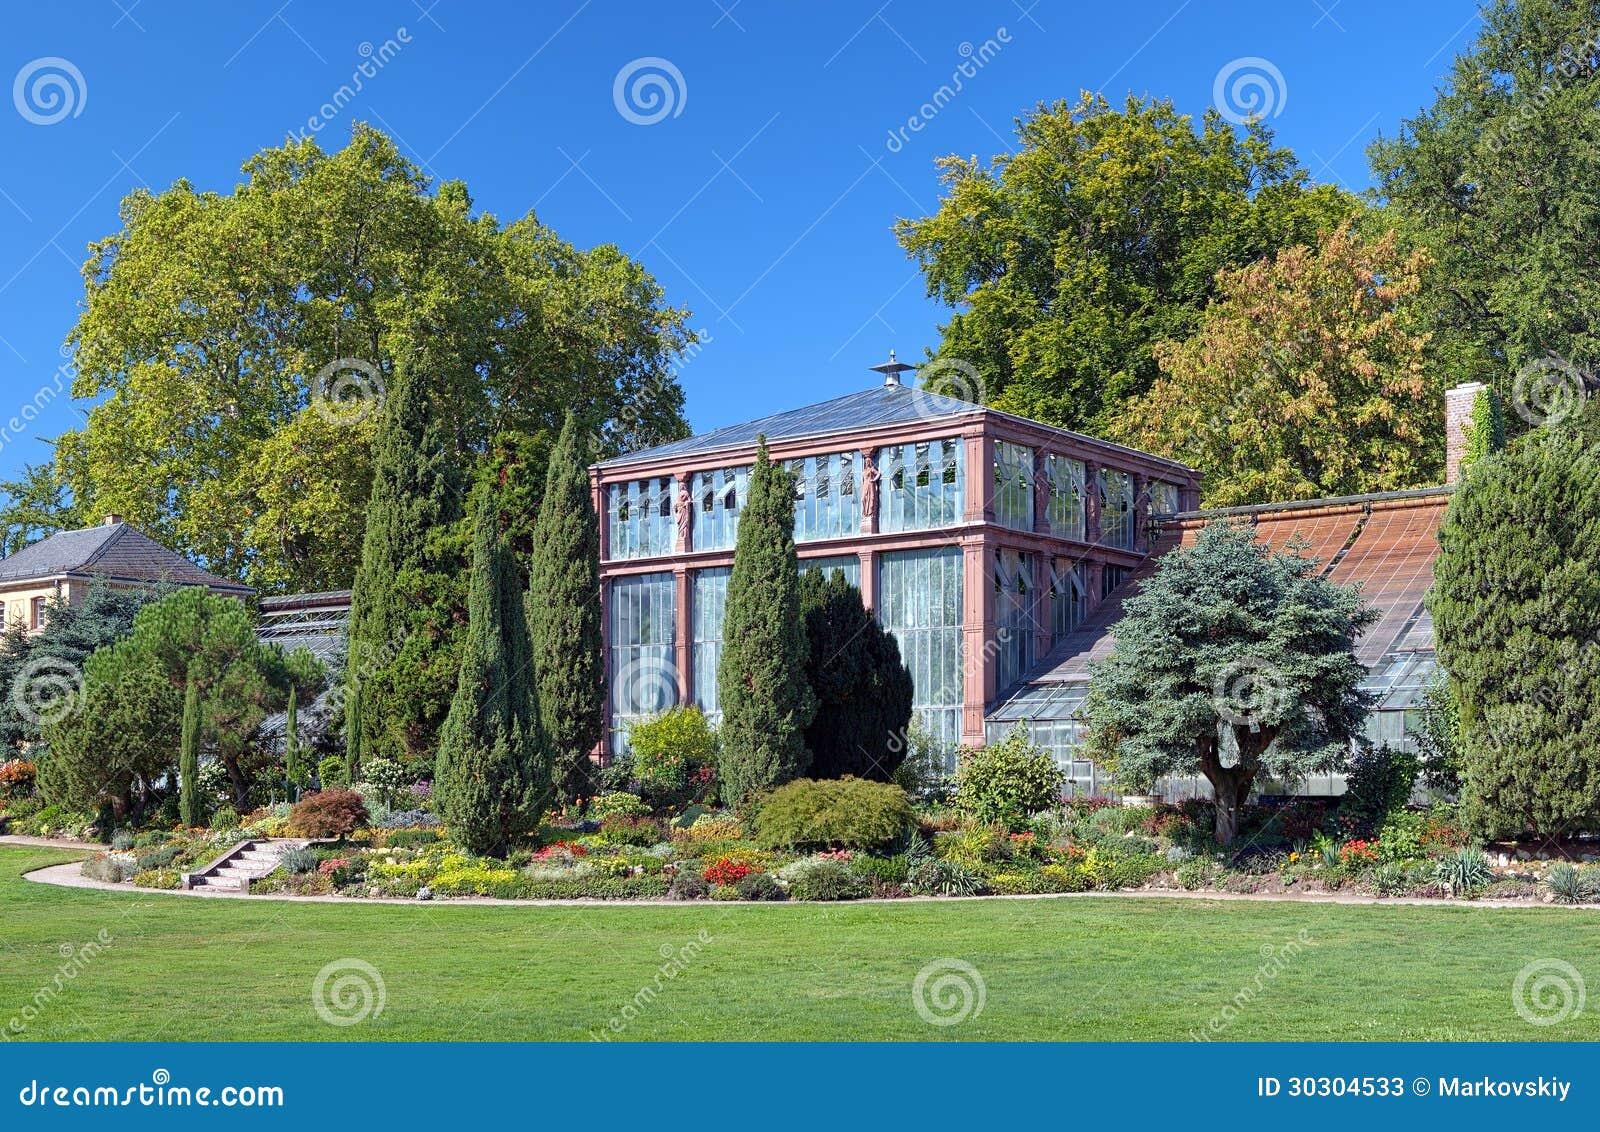 Botanischer Garten Karlsruhe Germany Stock Image Image Of